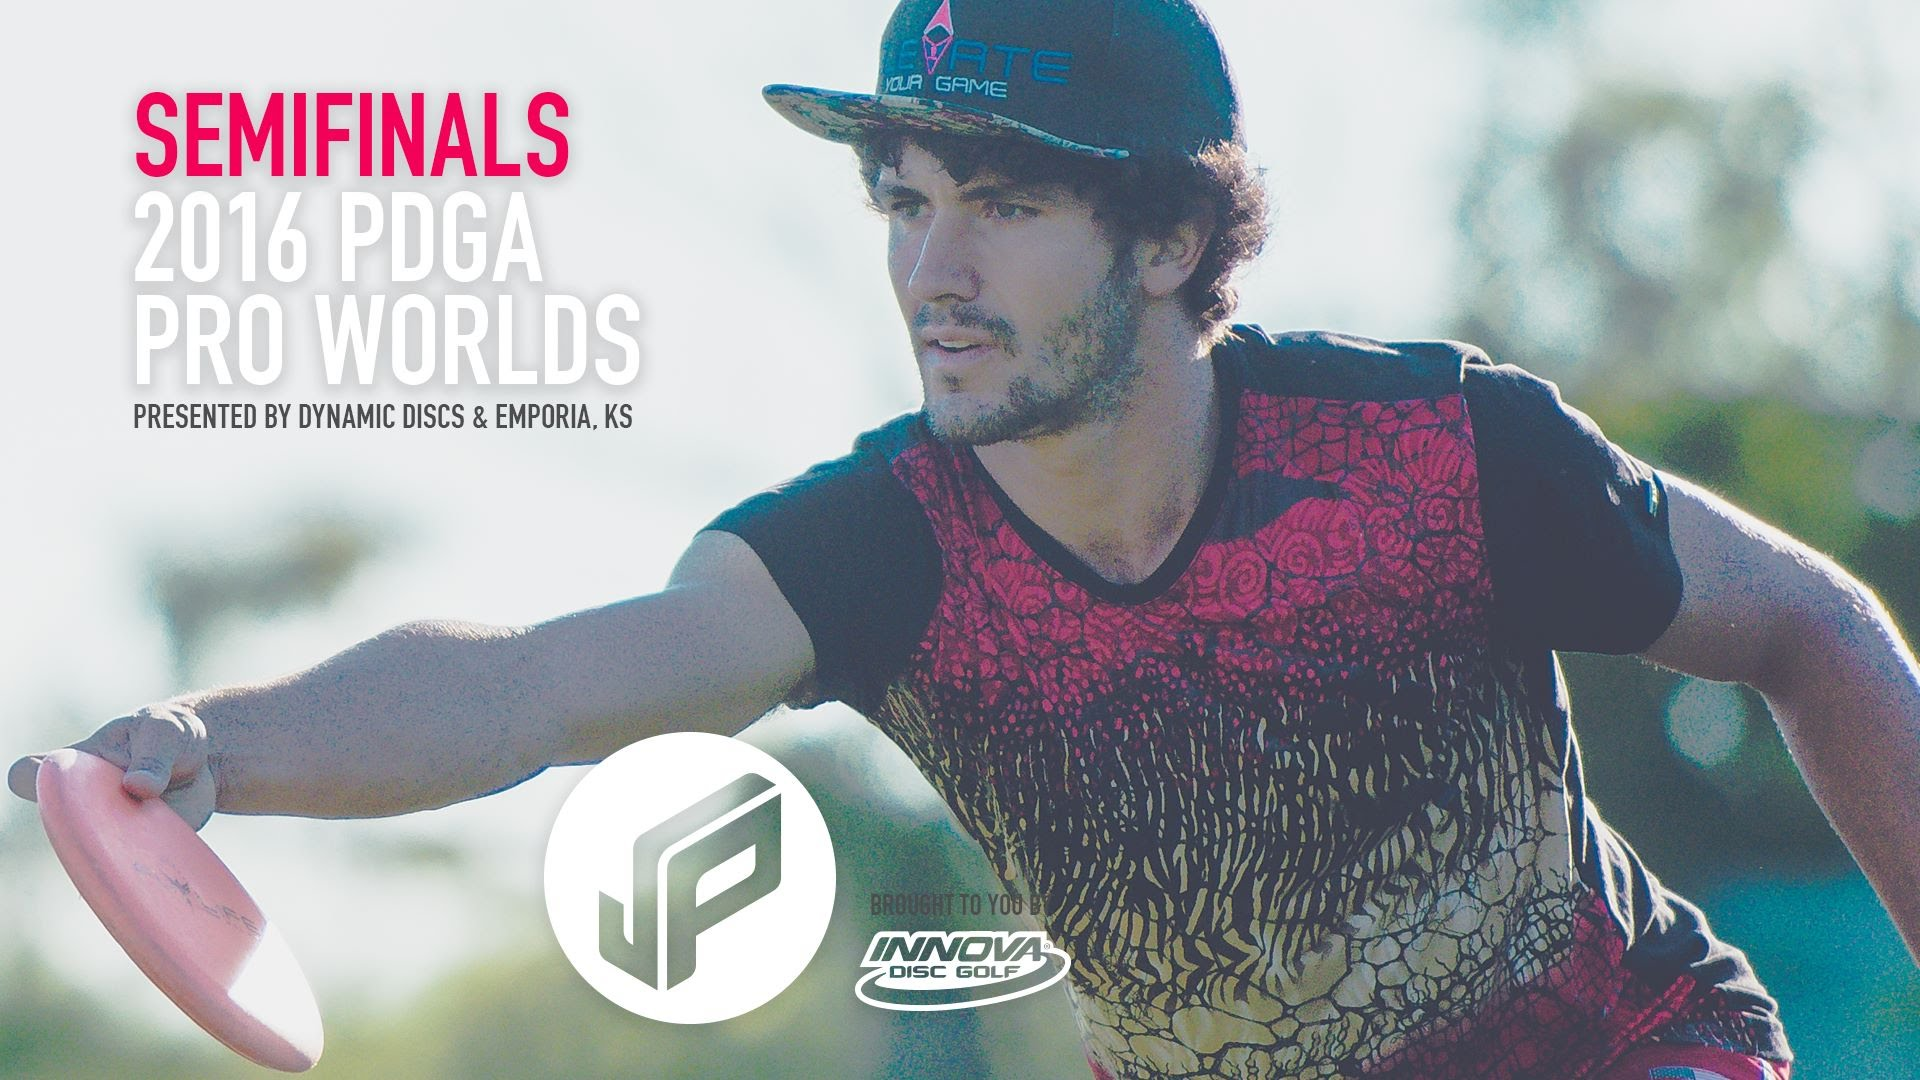 2016 PDGA Pro Worlds Semifinals